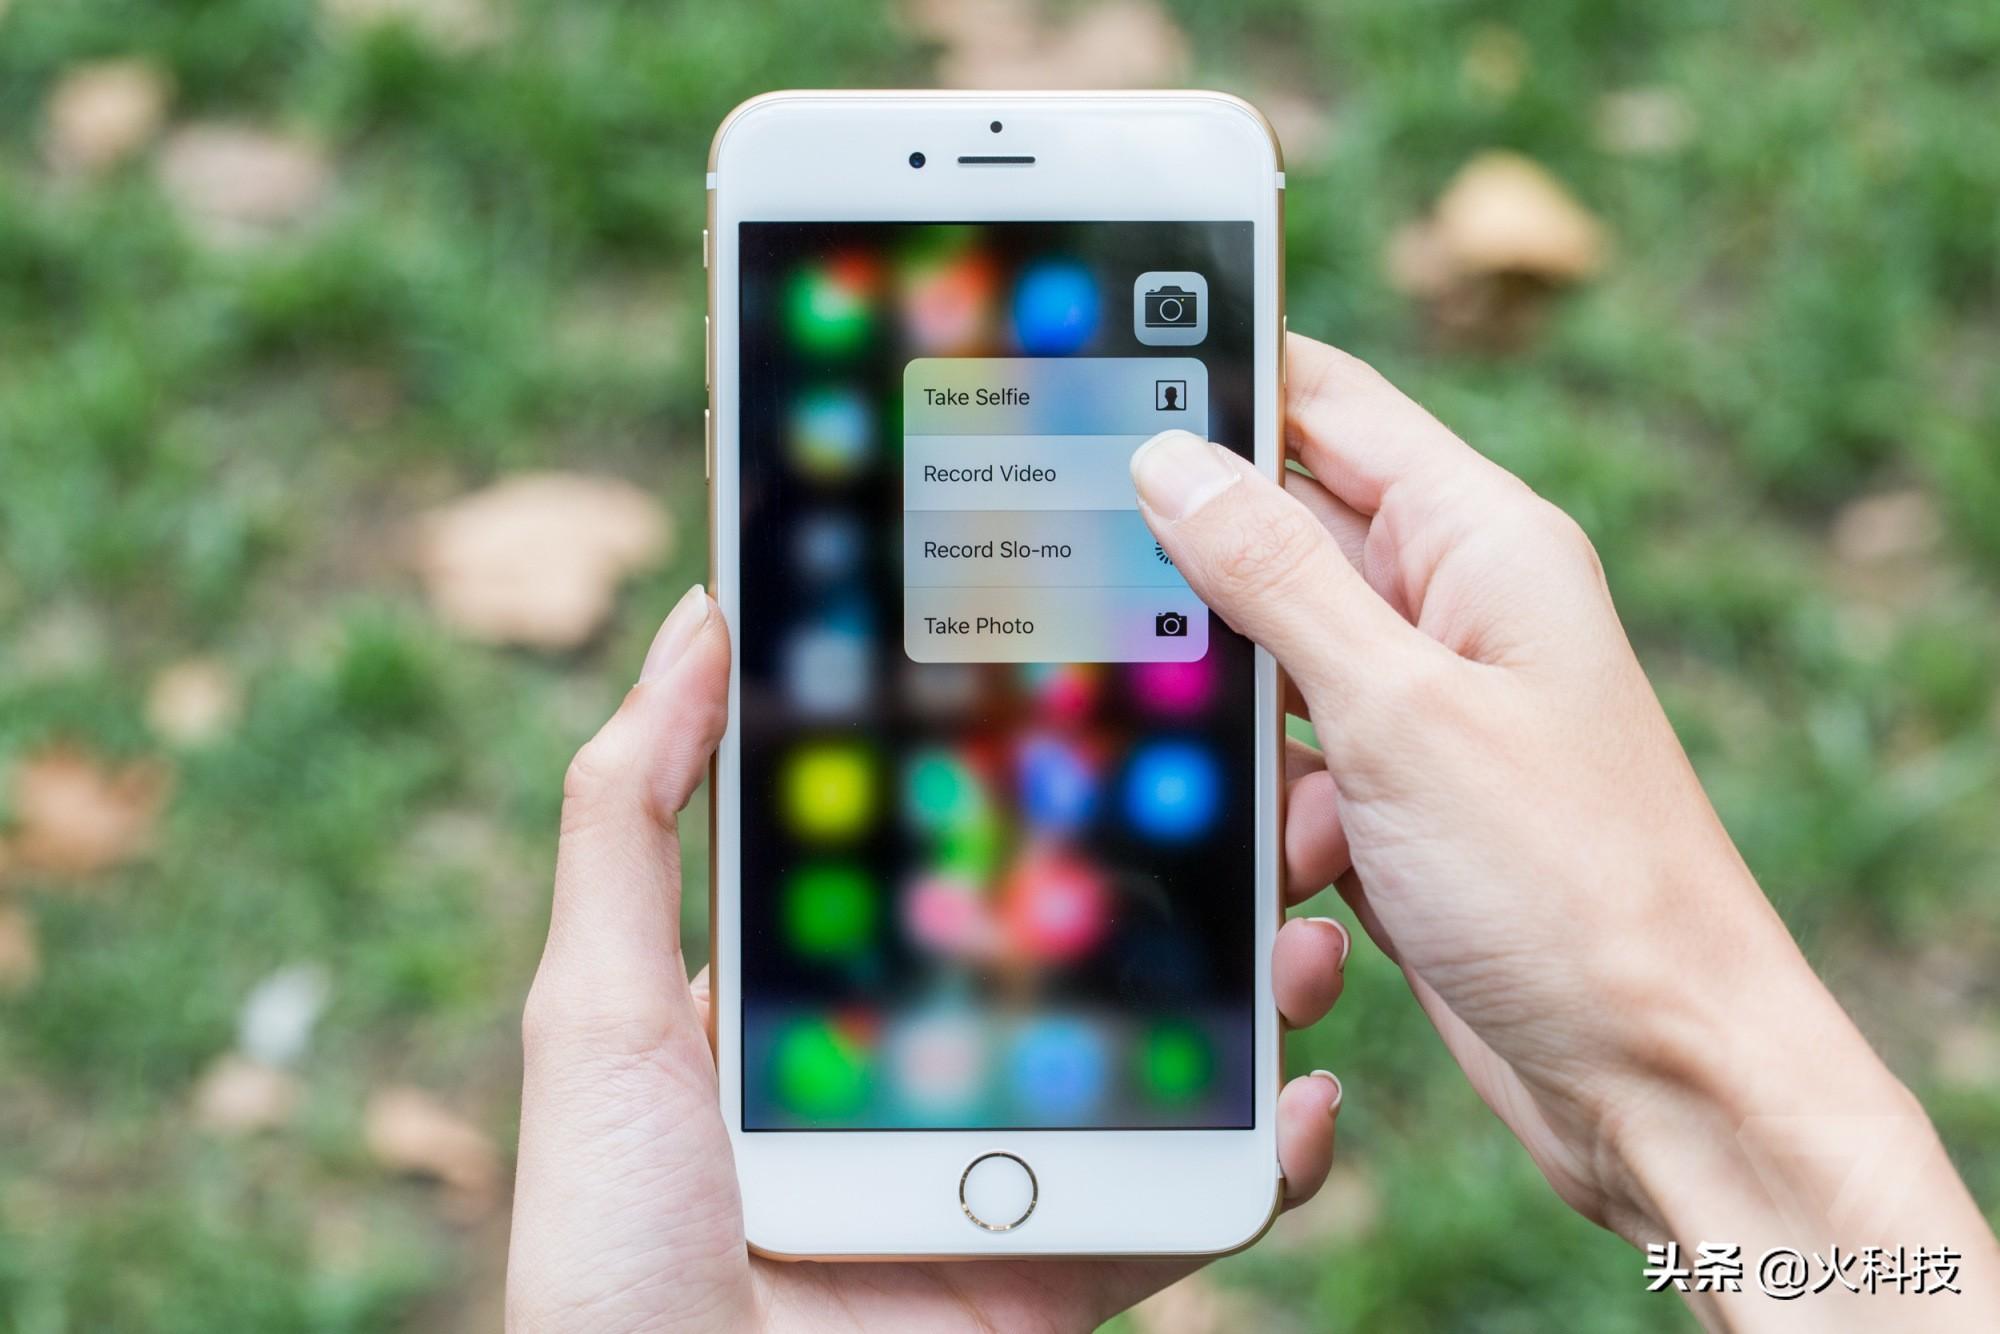 iPhone的旧款特性一样不输新机,这四款iPhone你感受过吗?